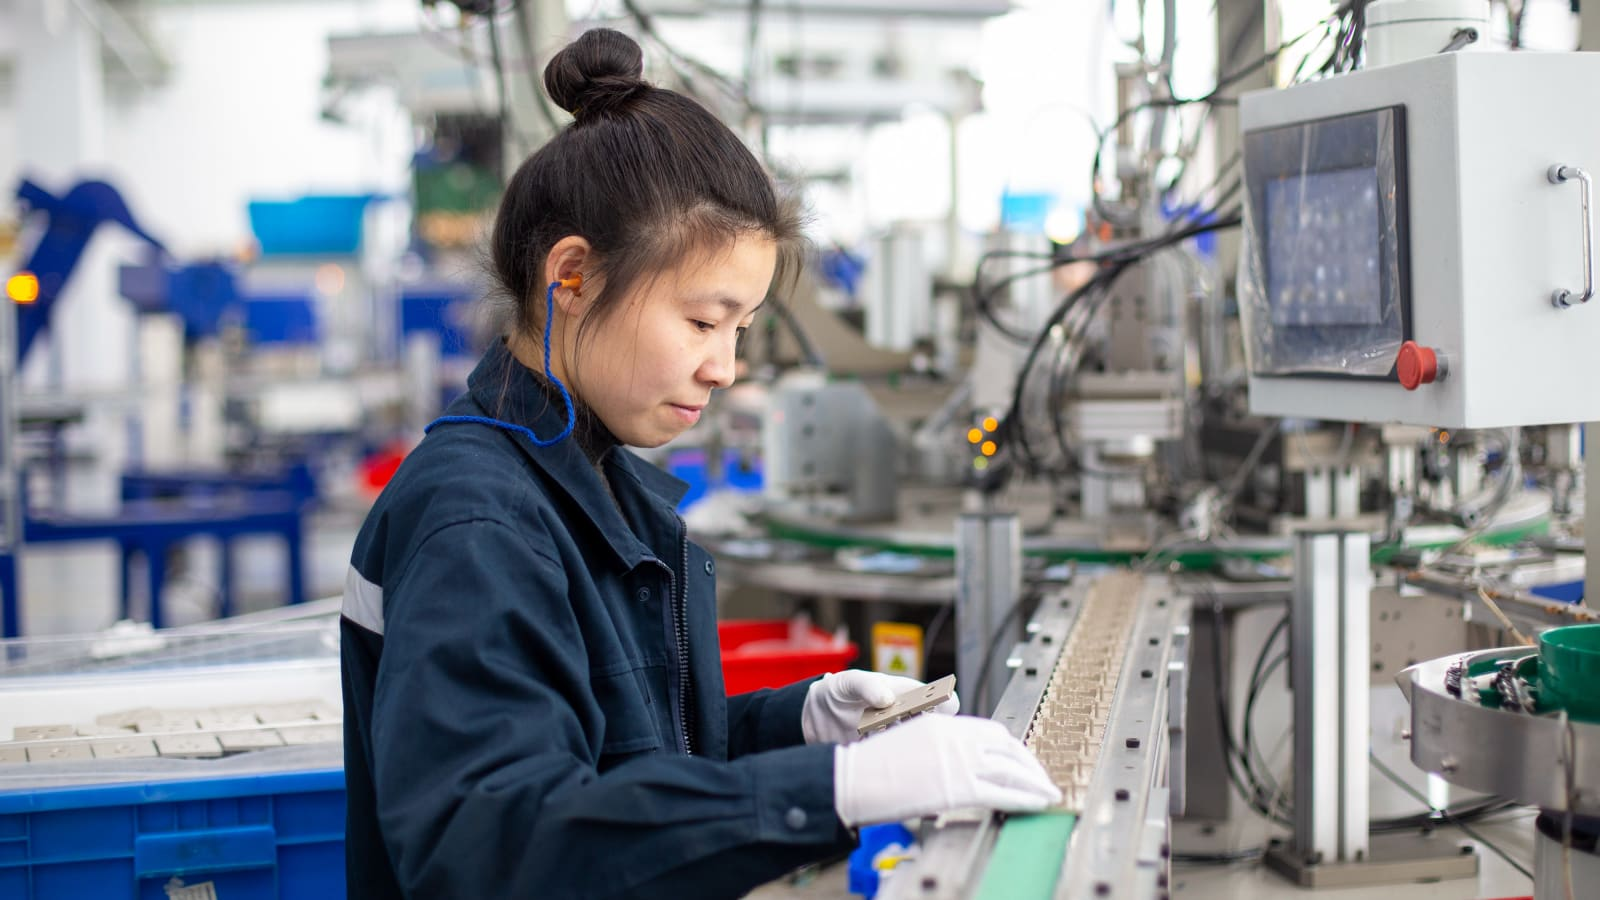 Supply chains may return to China amid Covid resurgence in India, Vietnam